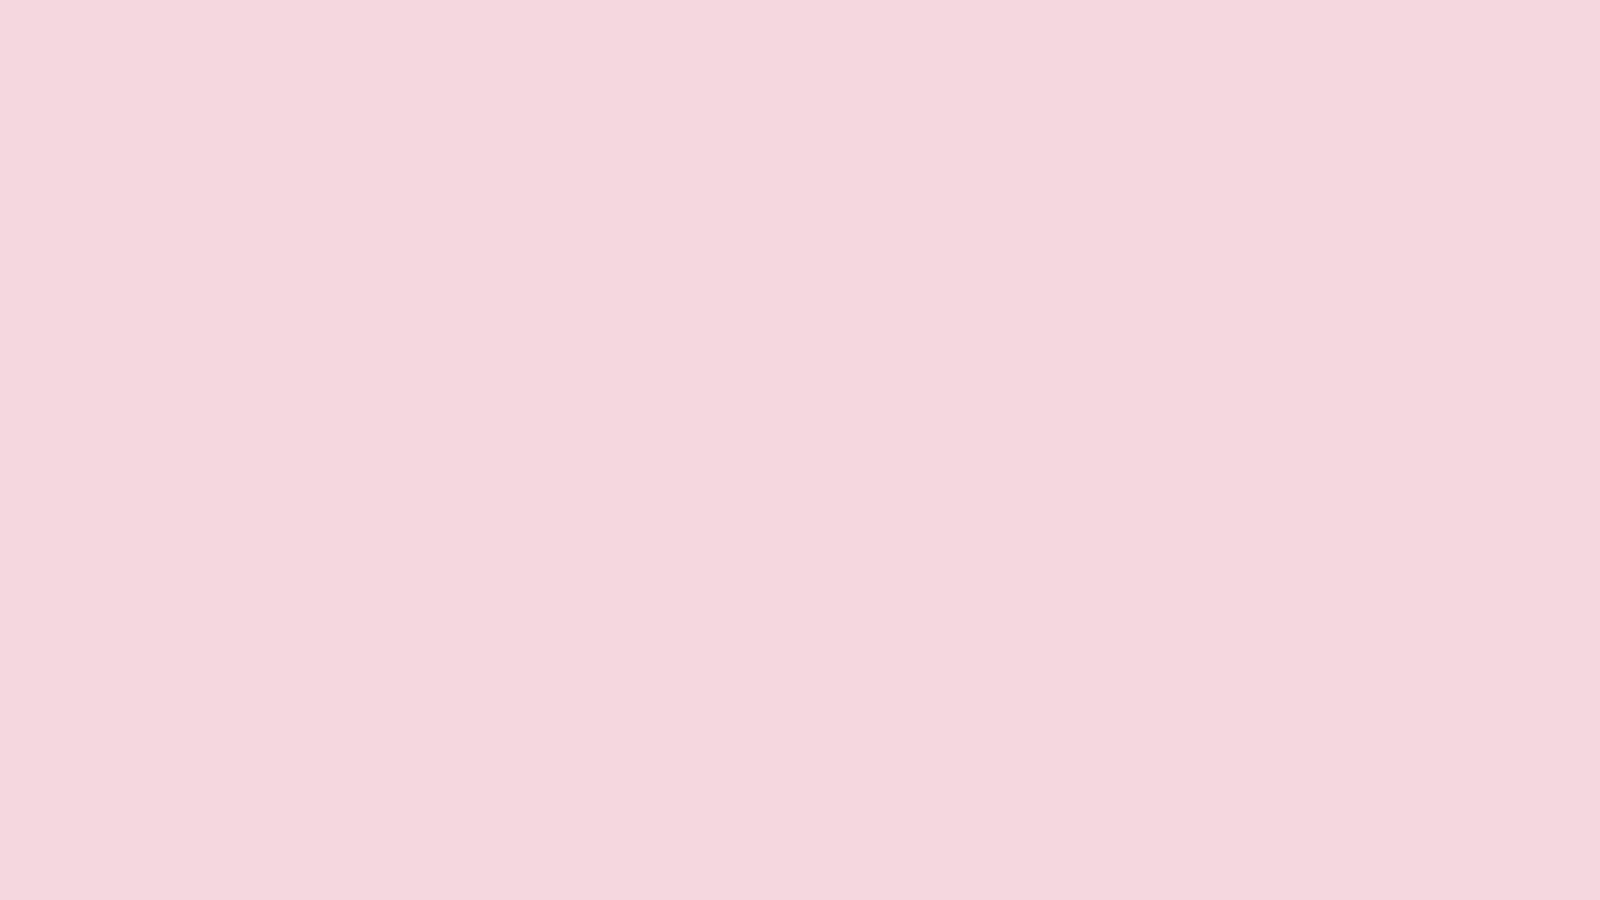 1600x900 Vanilla Ice Solid Color Background